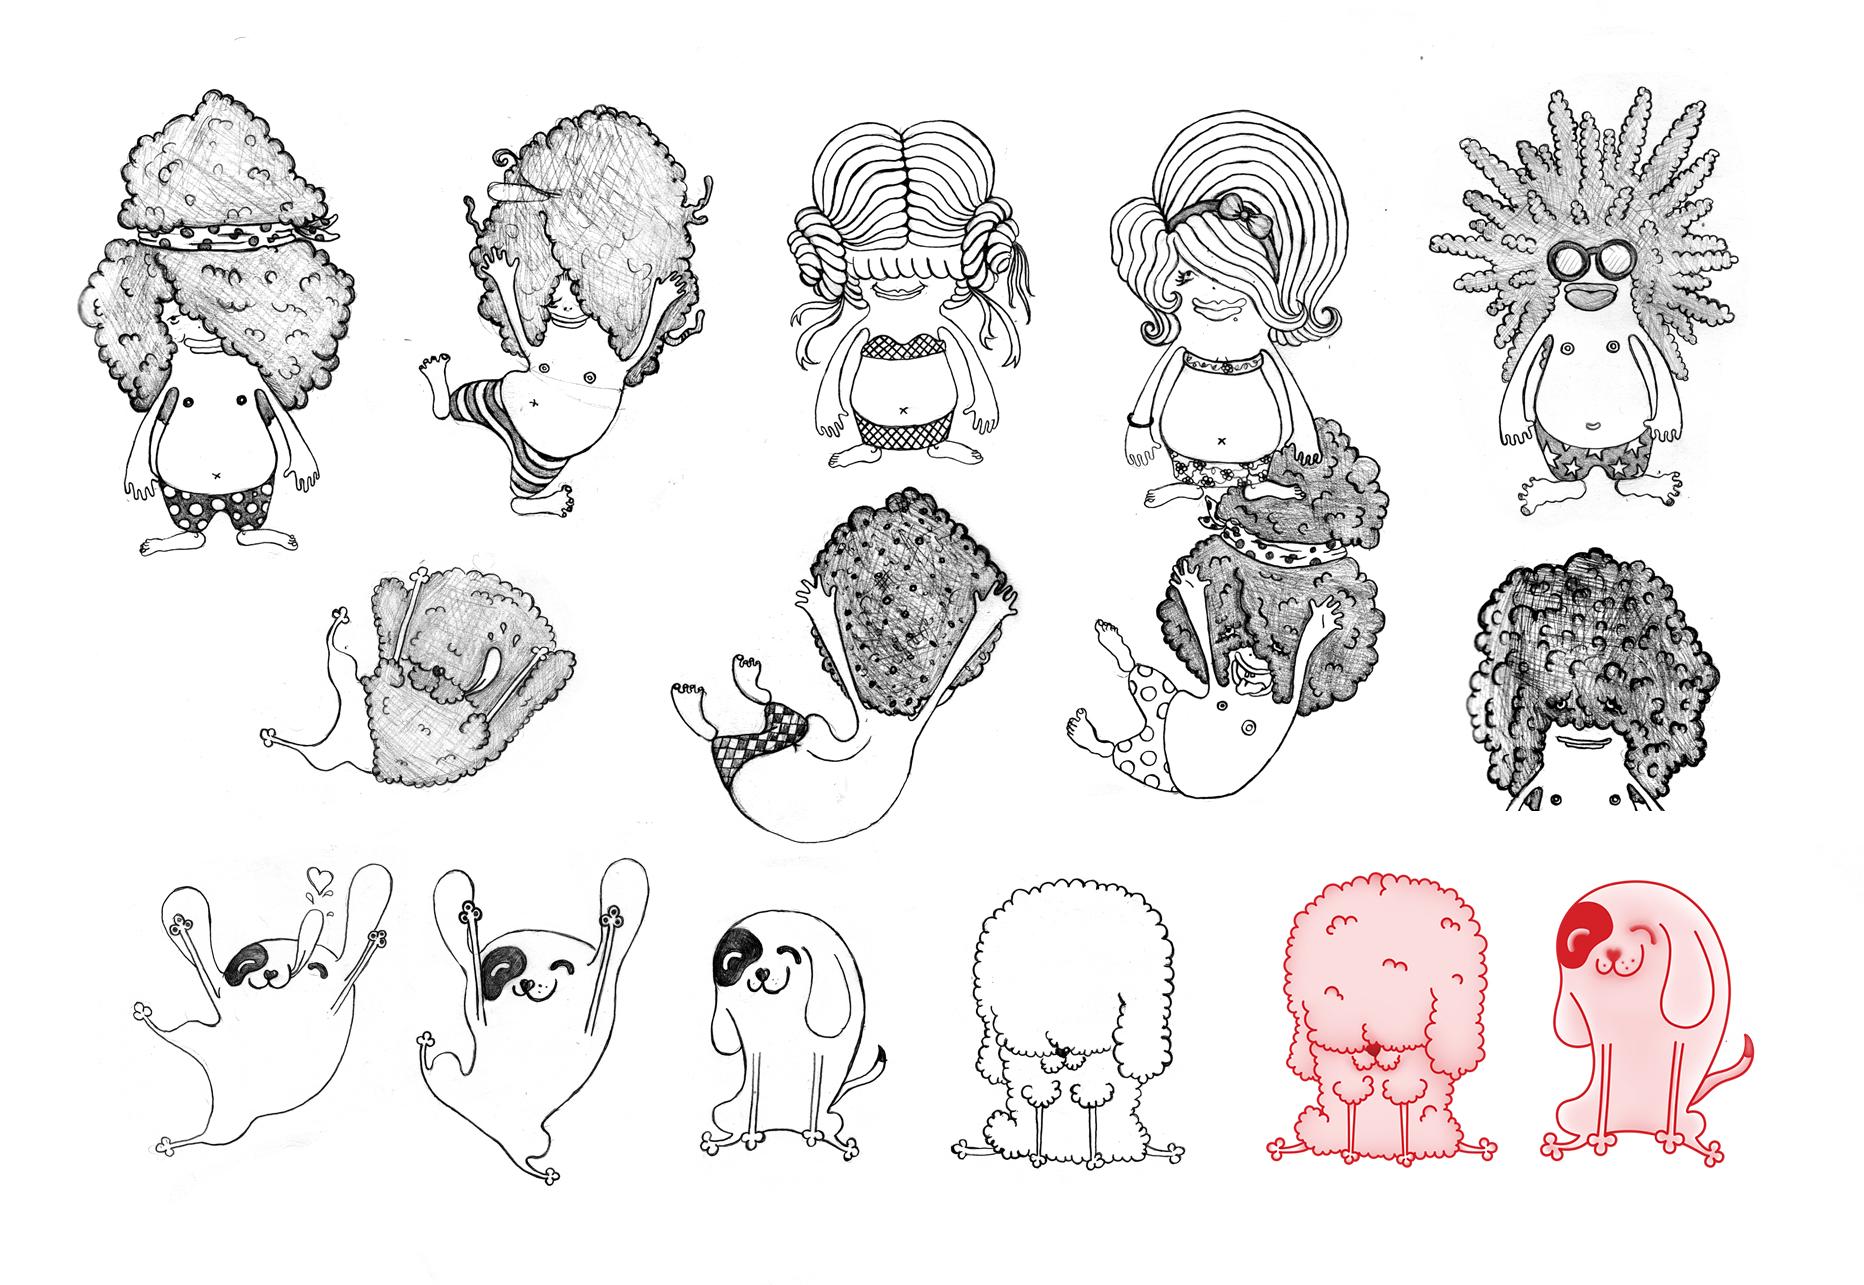 all_characters_sketch2.jpg